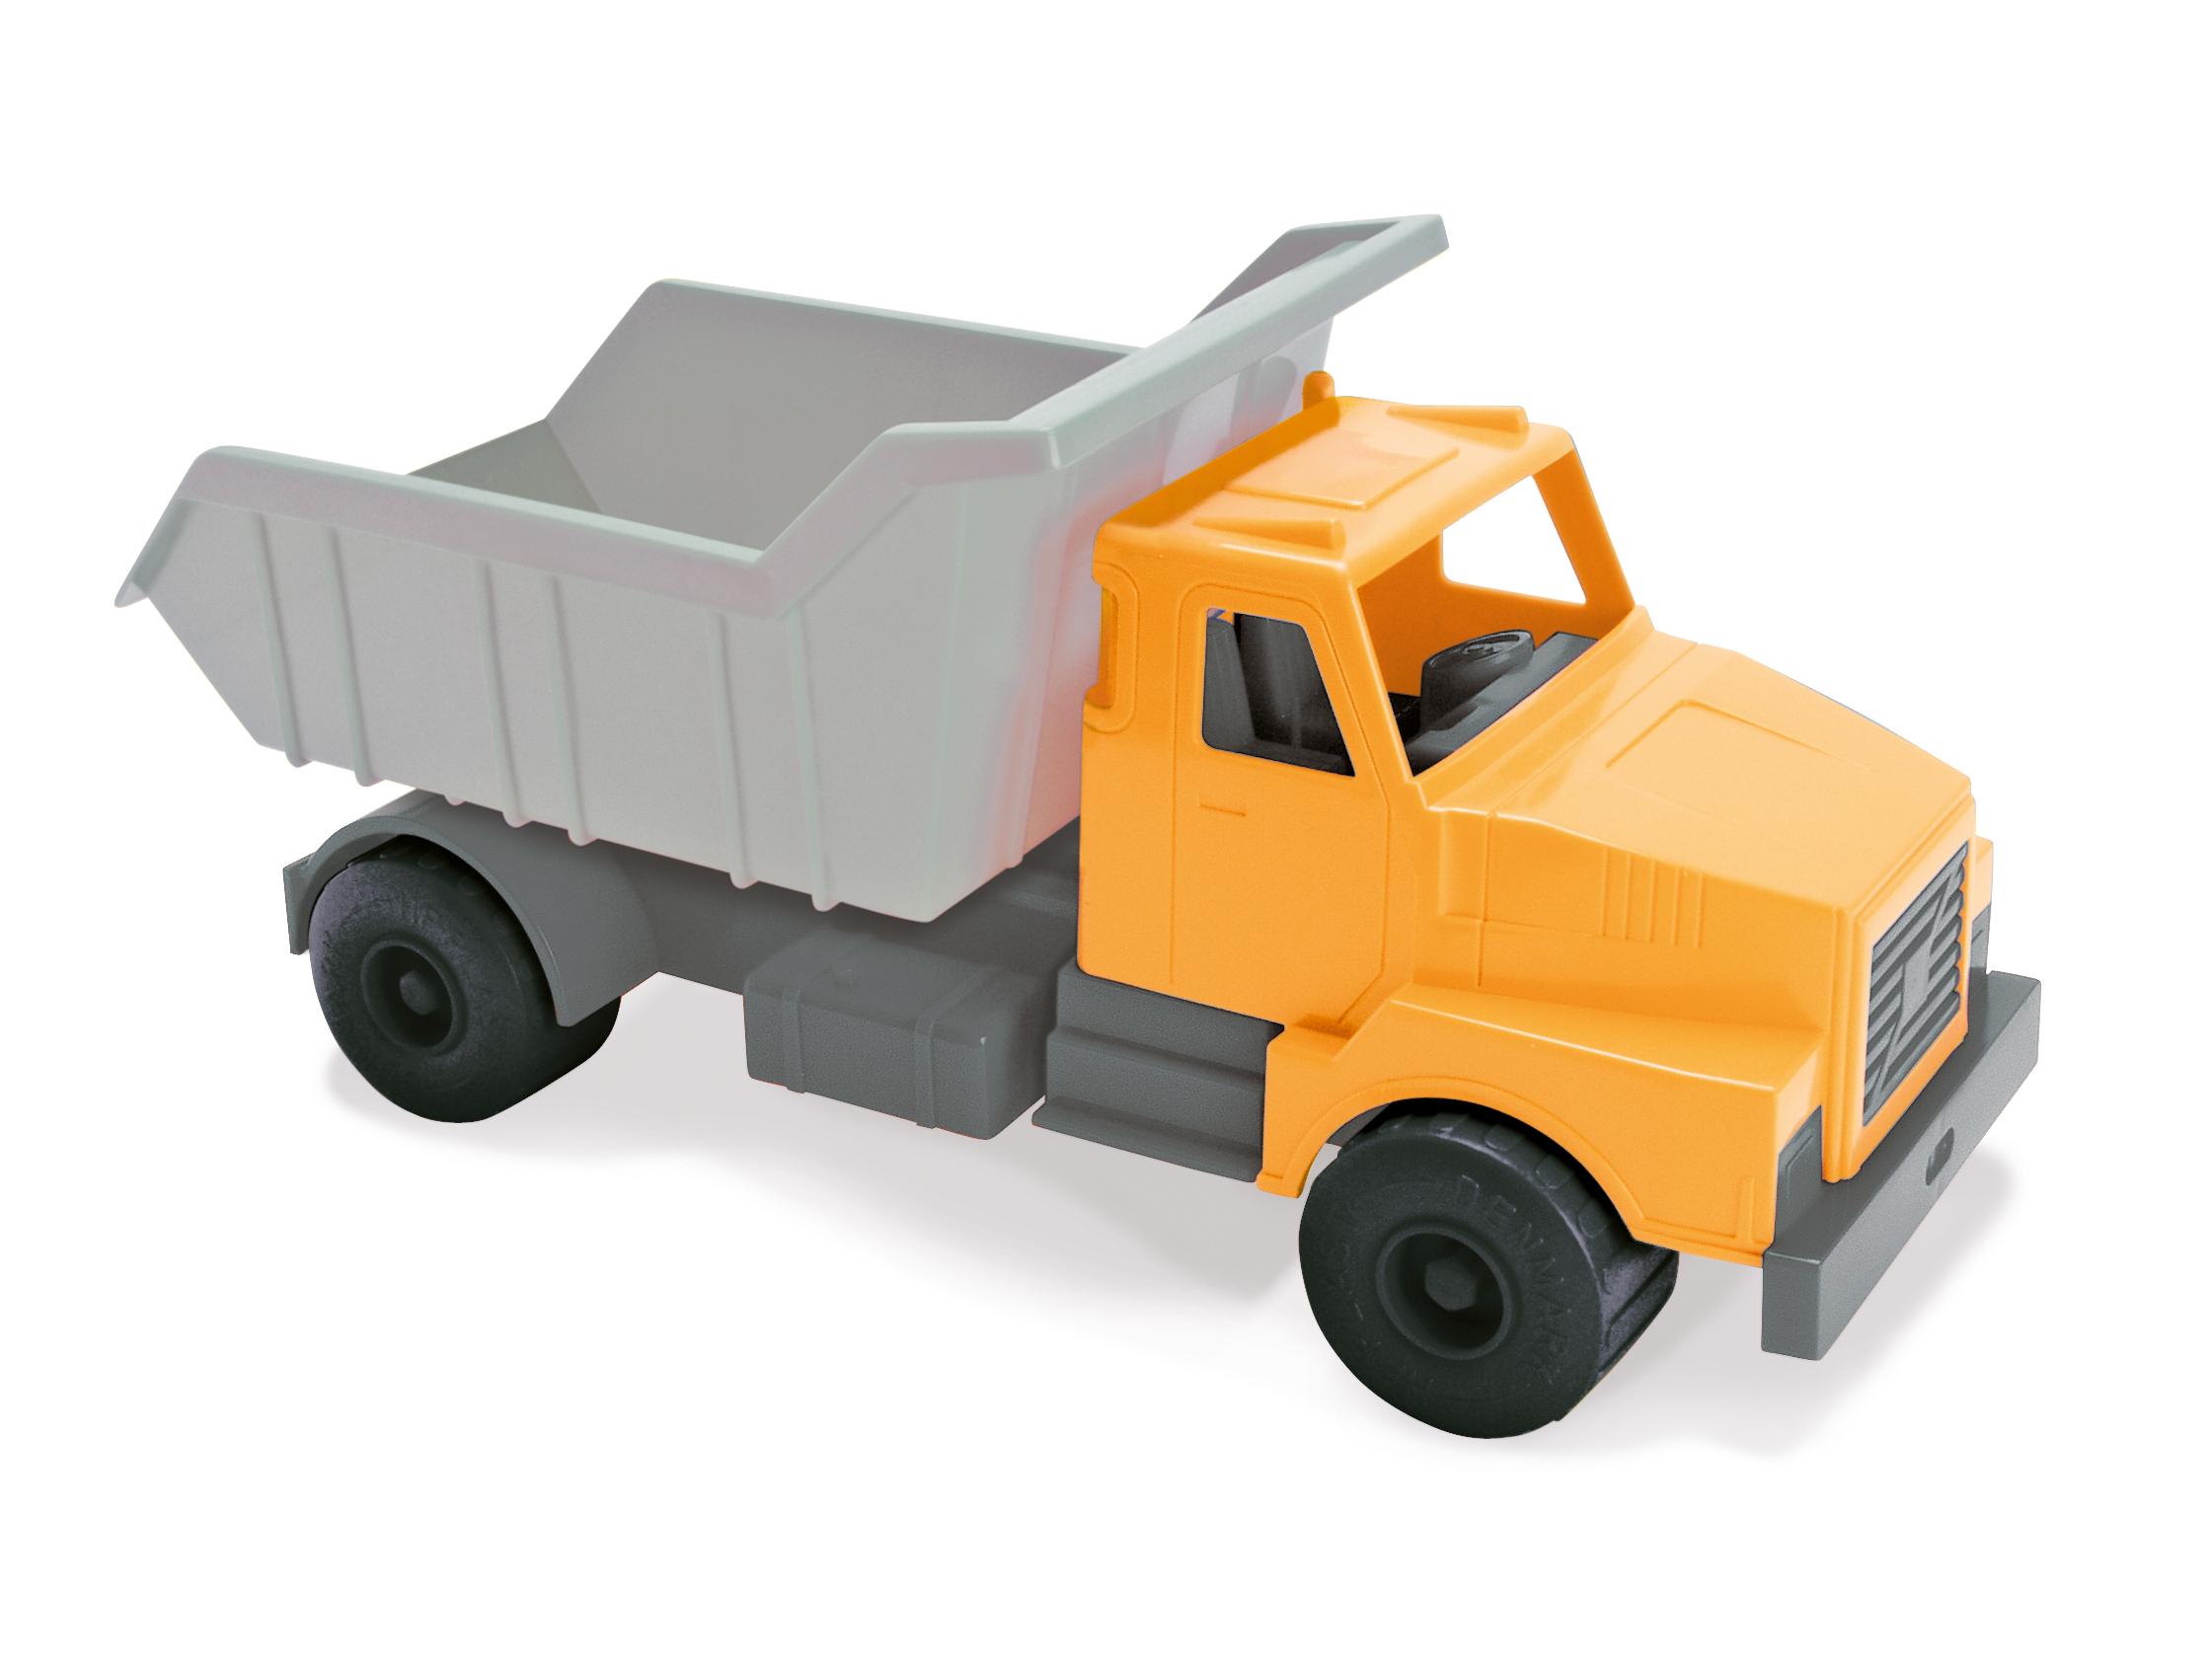 Dantoy - Dumptruck, 45 cm (2235)